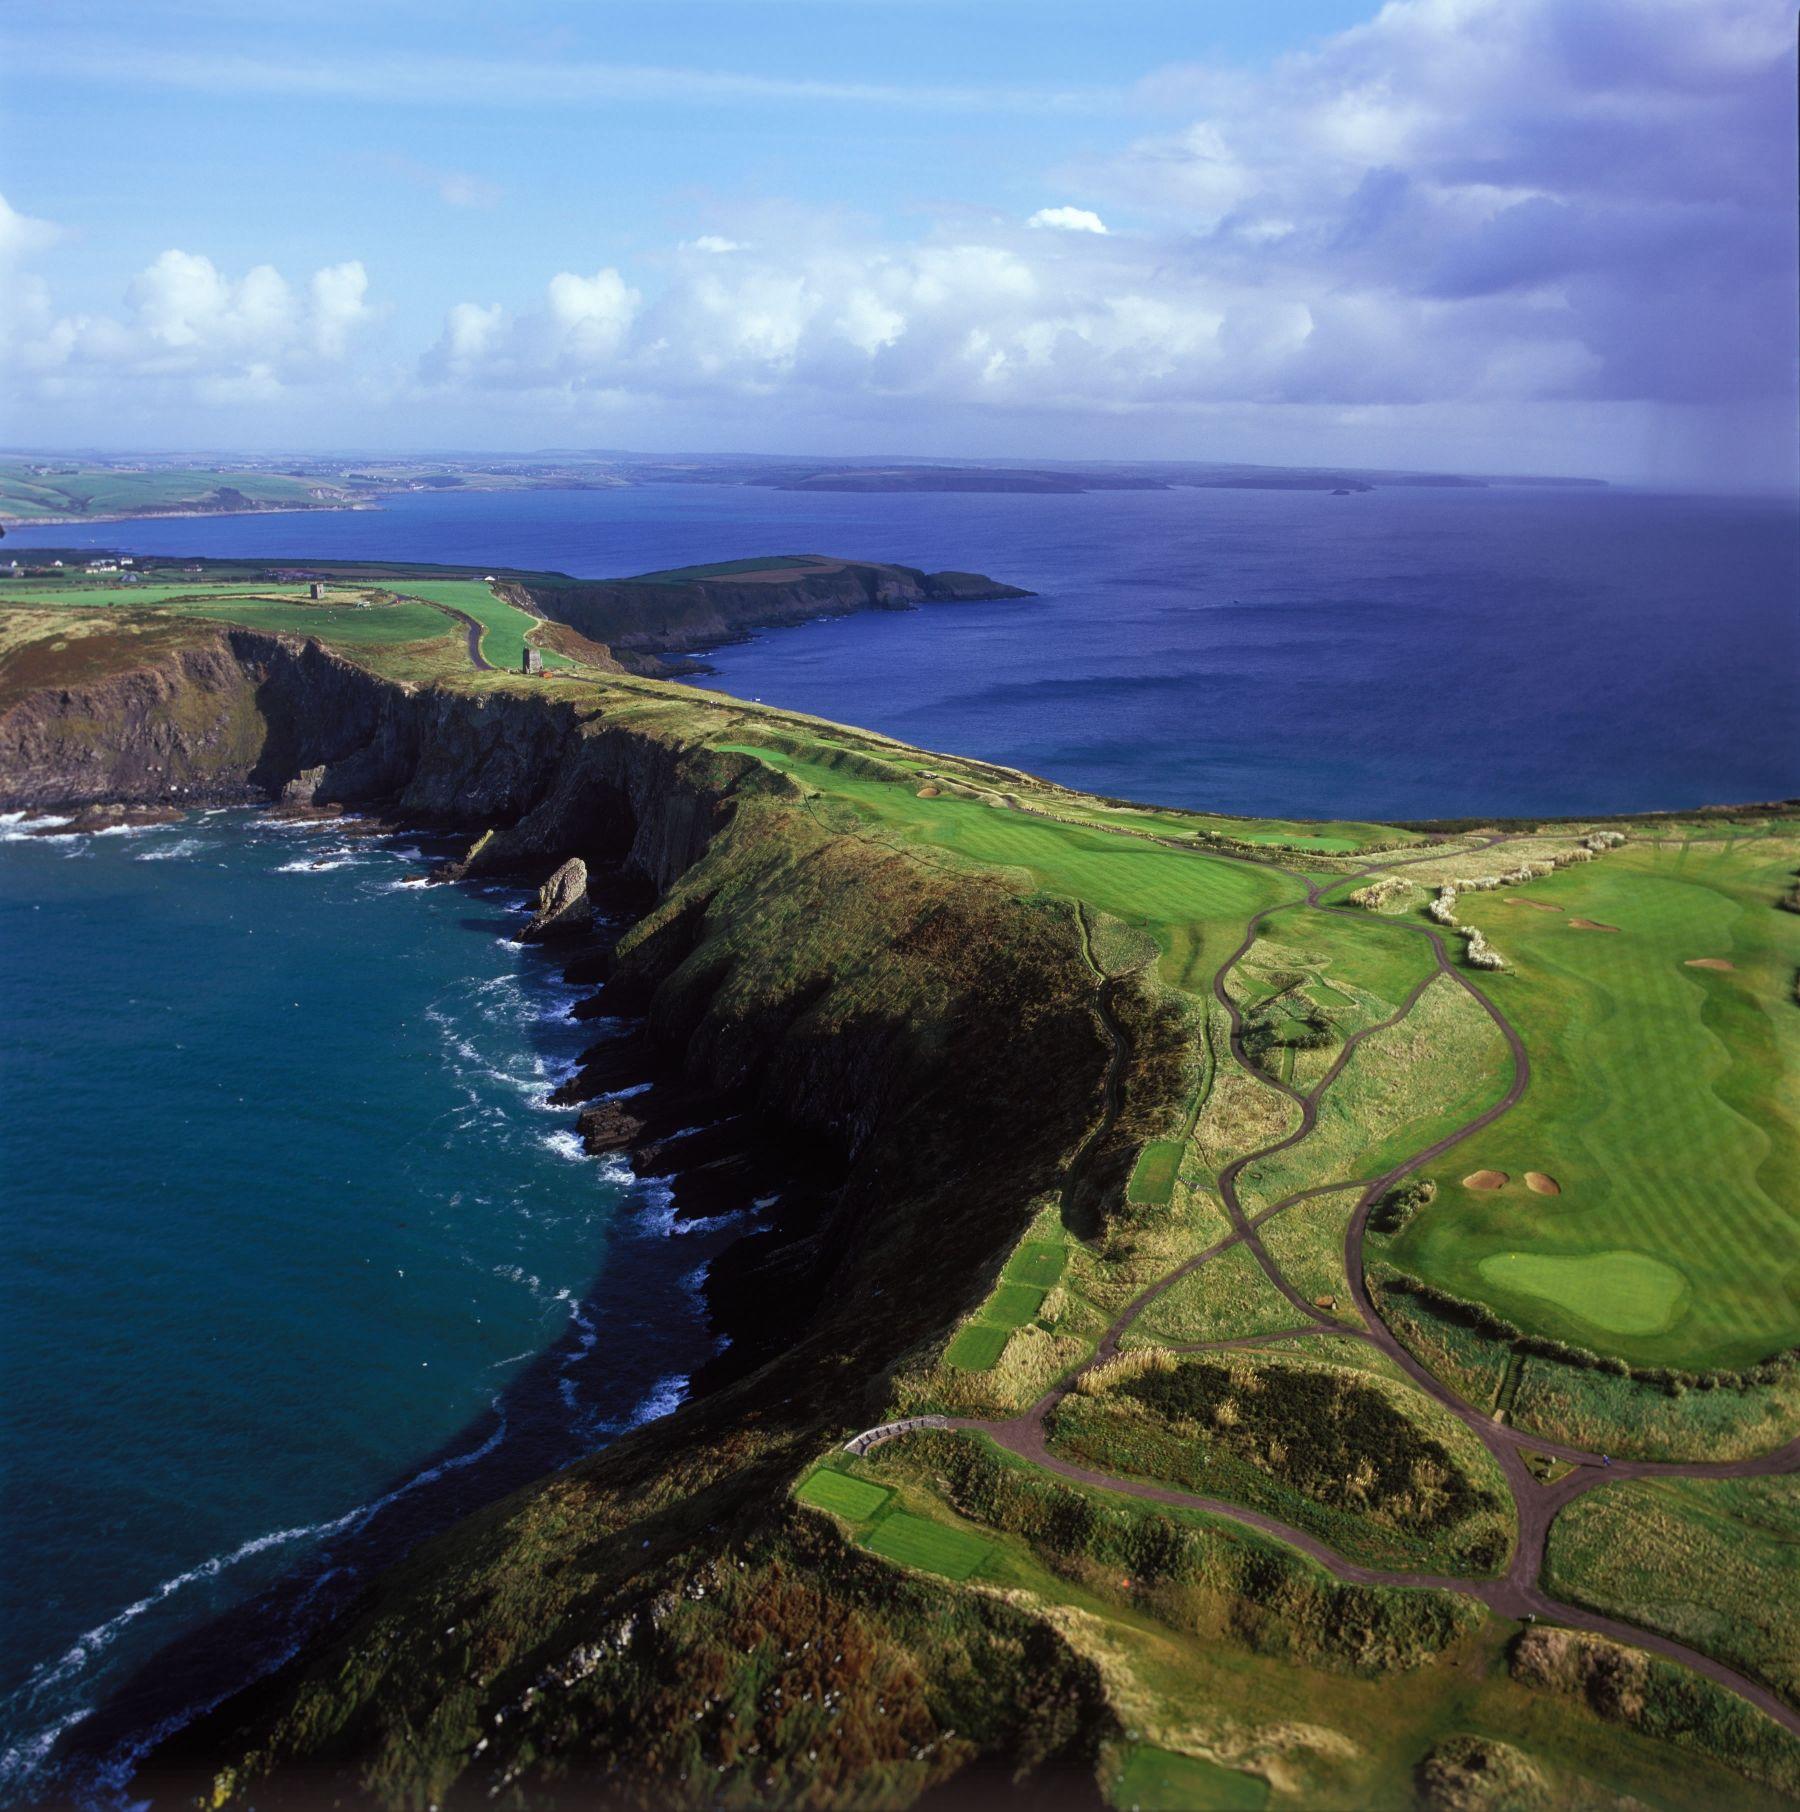 Sueno hotel atlantic golf holidays atlantic golf holidays - Bring Your Camera And Extra Golf Balls The Old Head Golf Links Sits On Atlantic